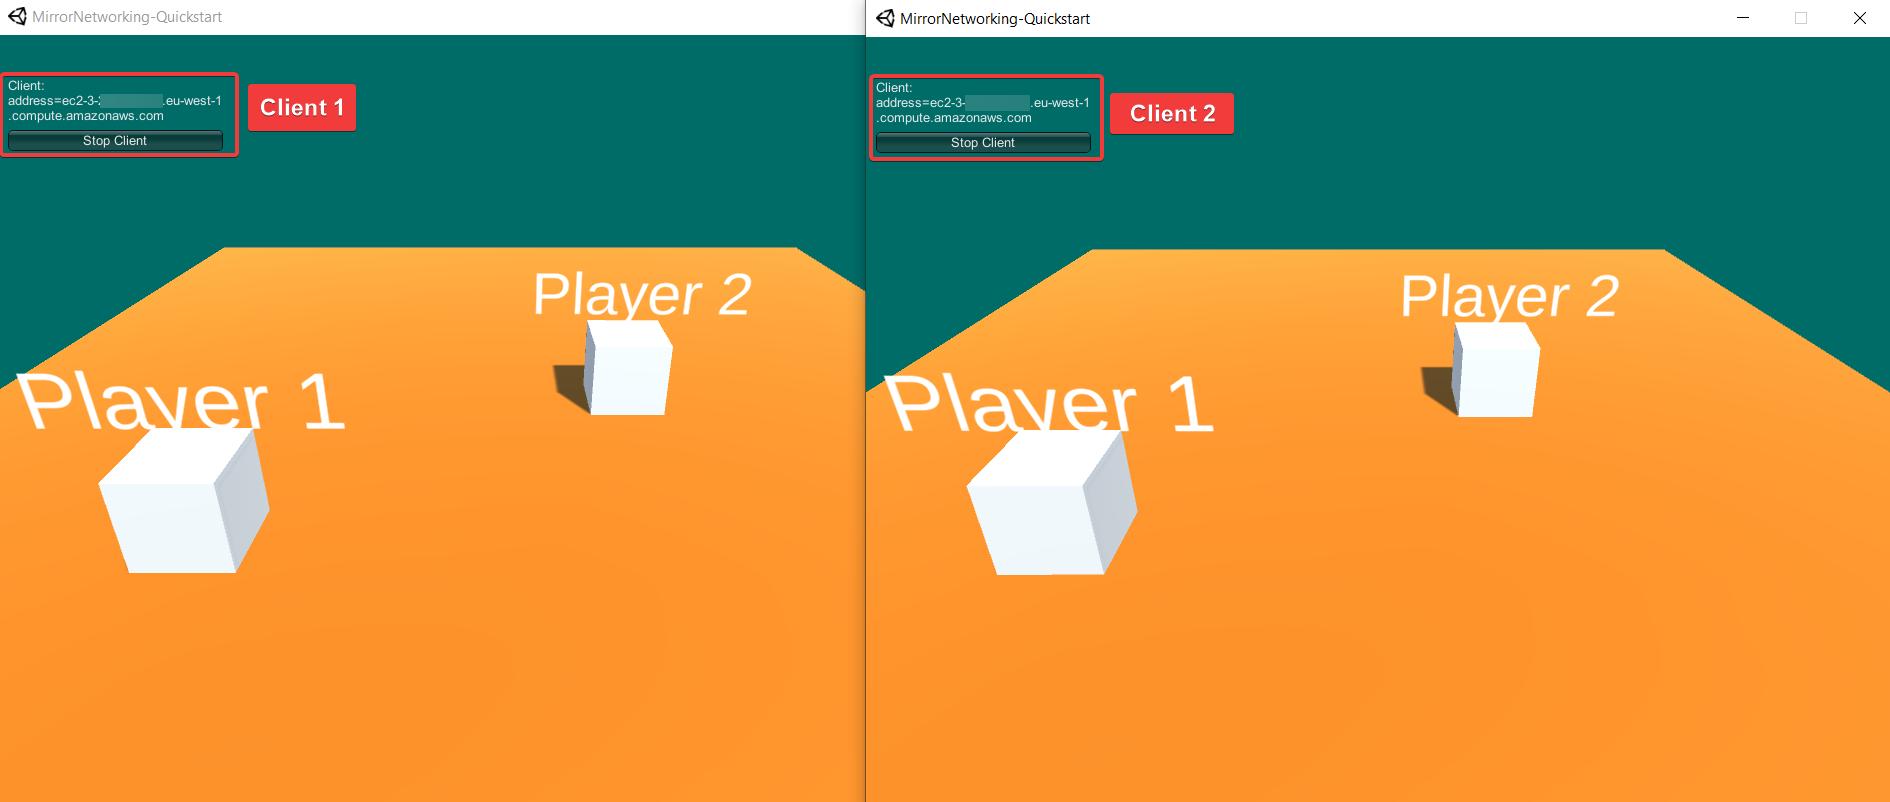 Mirror-Server-hosten-AWS-Clients.png (133 KB)